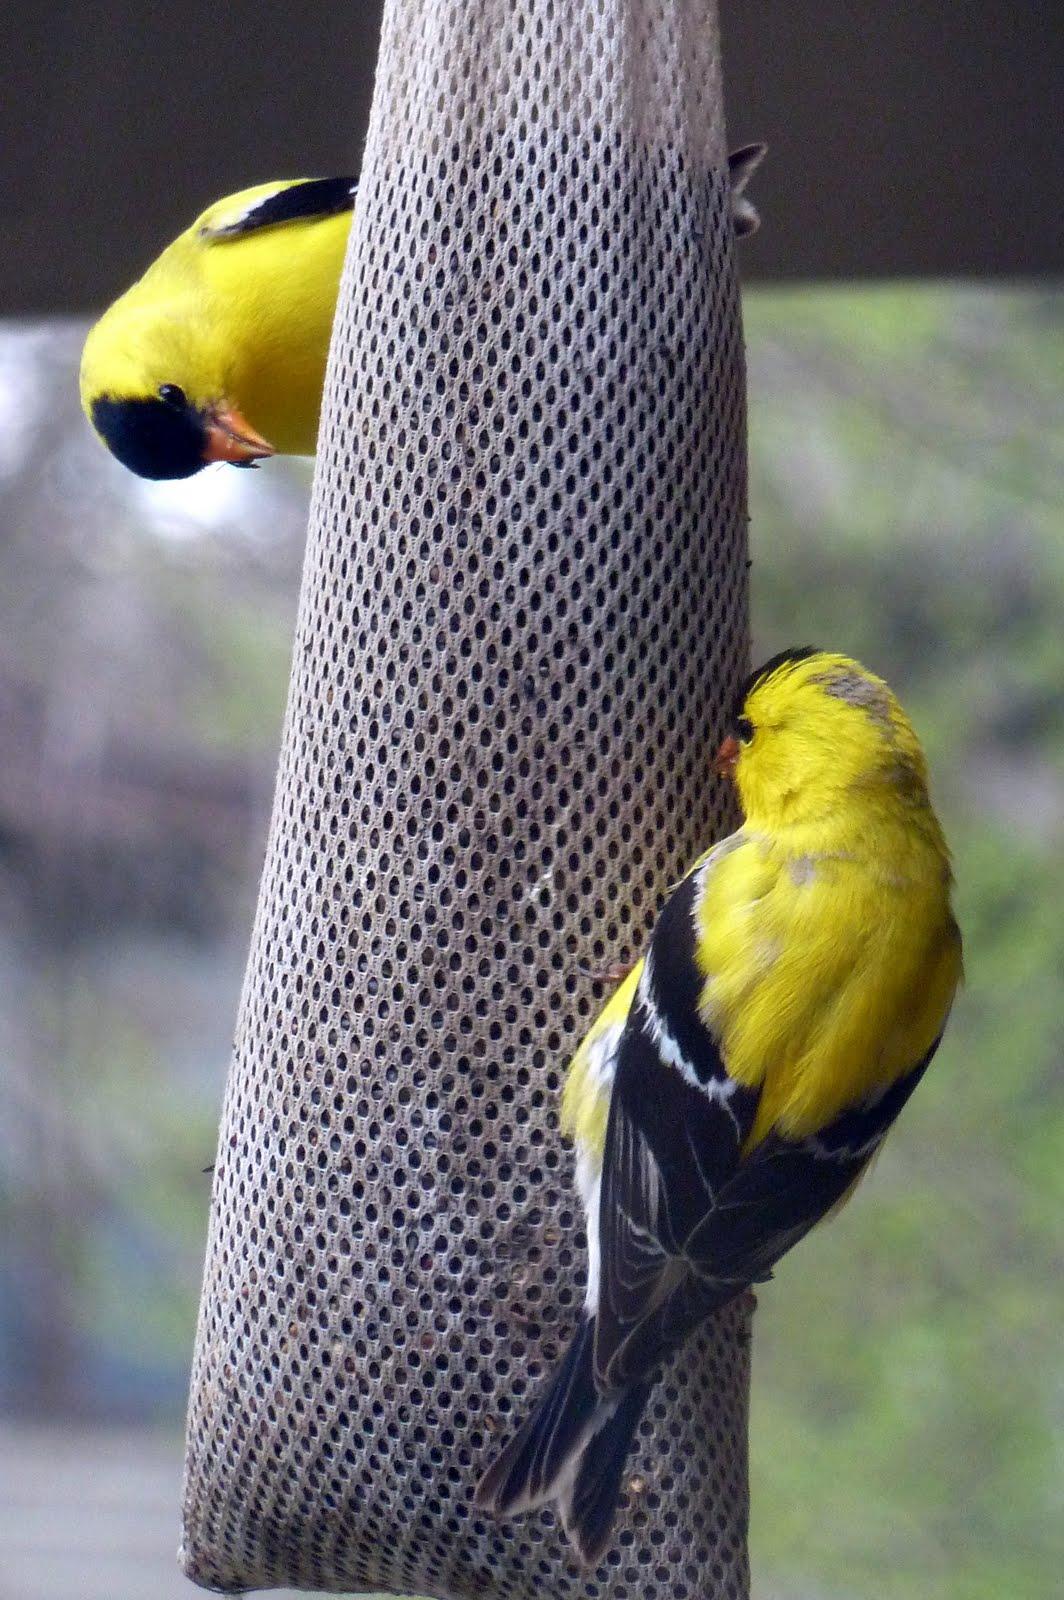 image feeders for finch photo stock yellow bird enchanting feeder full ergonomic beaks no and